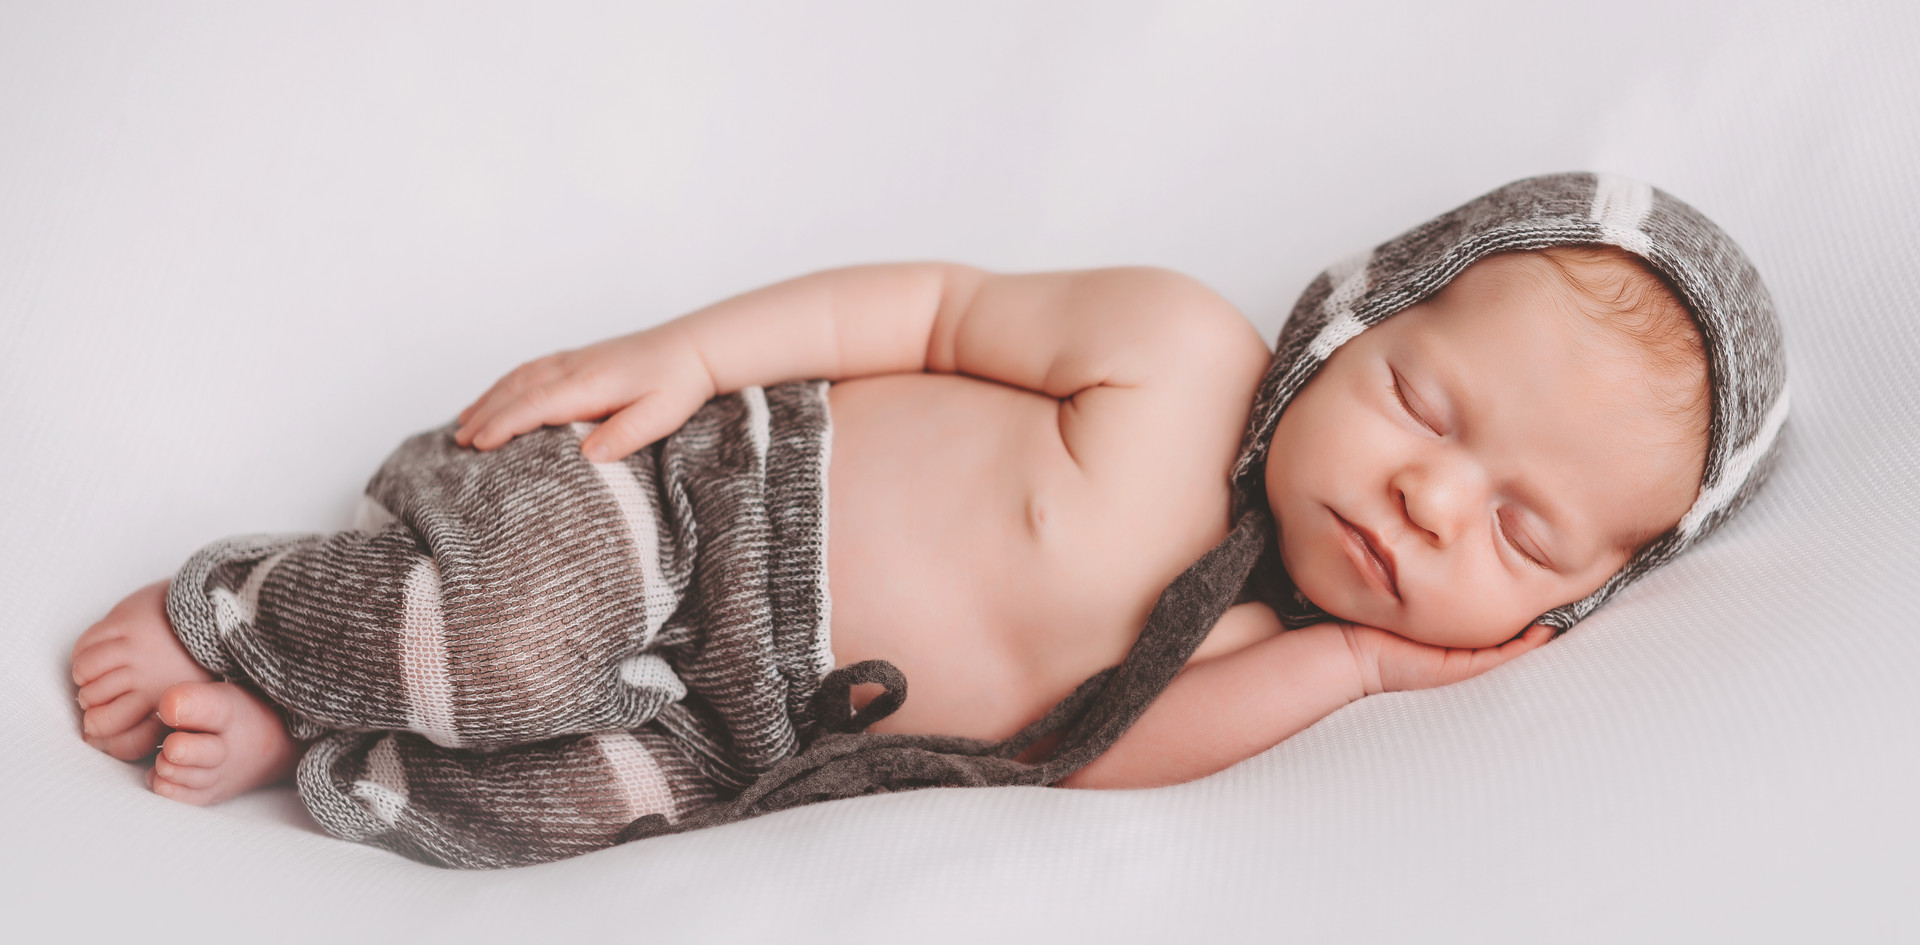 KSP_2020_Newborn_Logan_009-Recovered.jpg